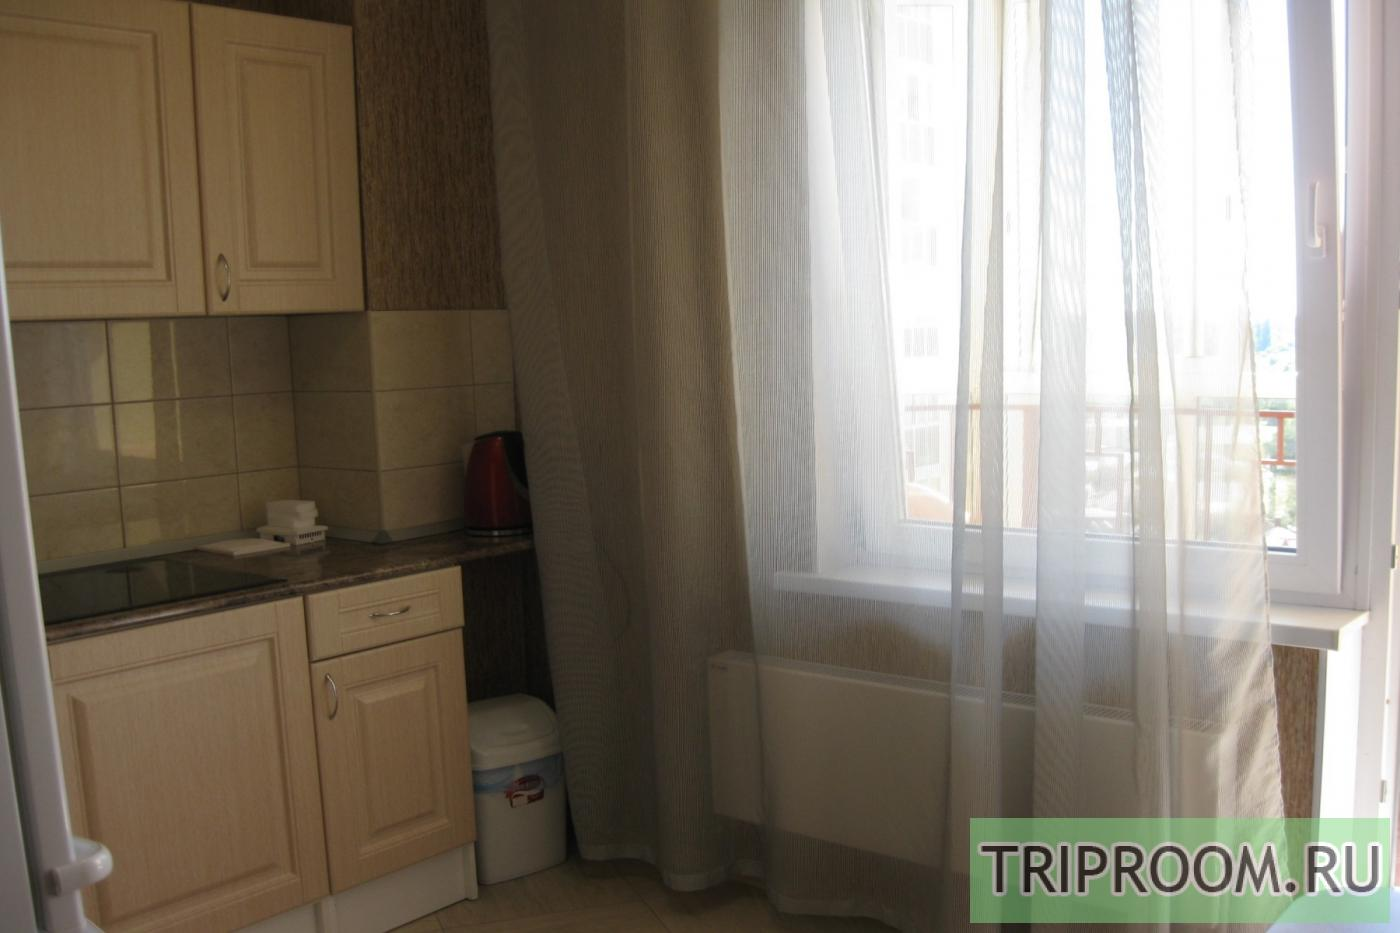 1-комнатная квартира посуточно (вариант № 22849), ул. Шишкова улица, фото № 5